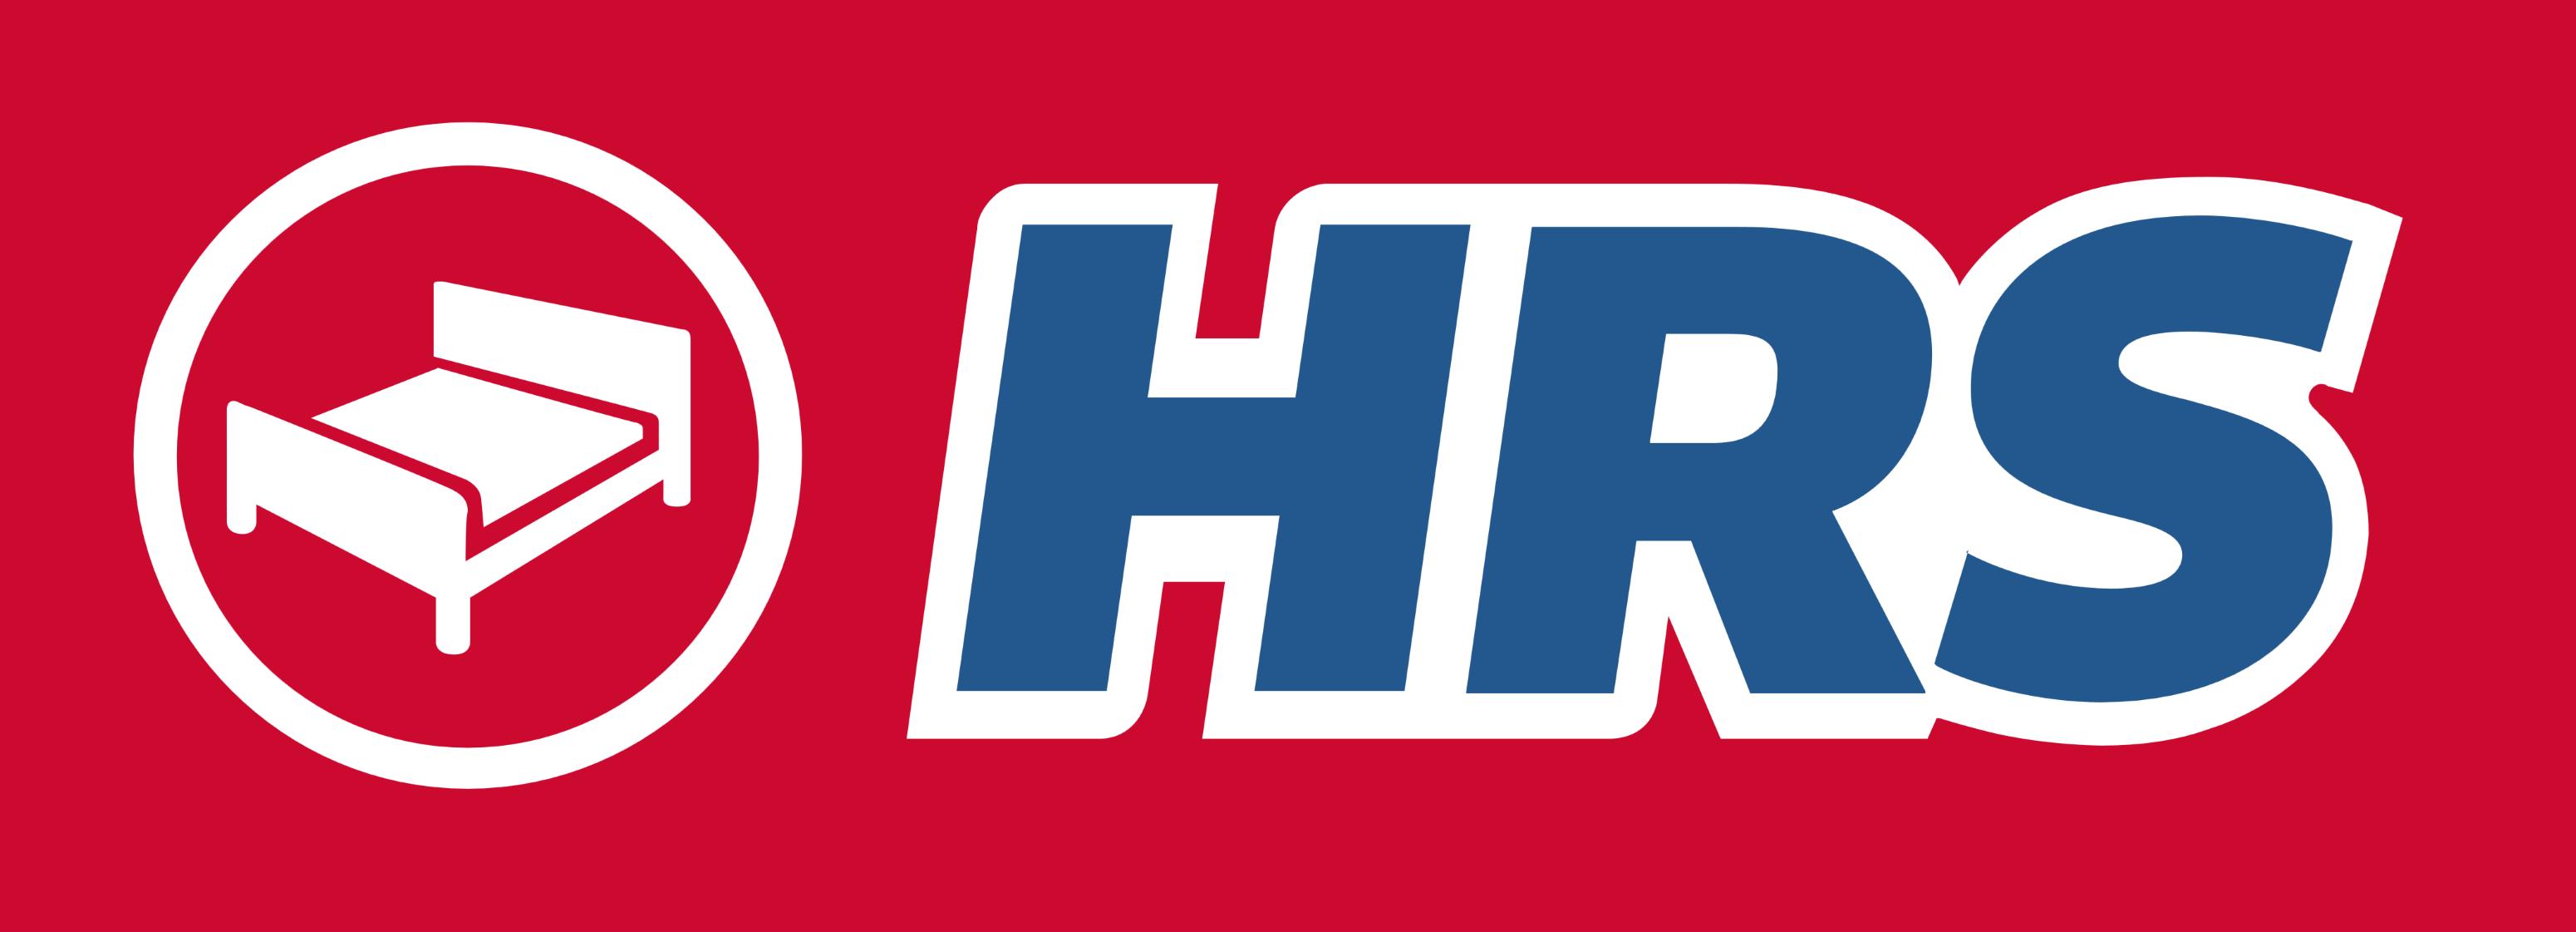 World health organization logo vector